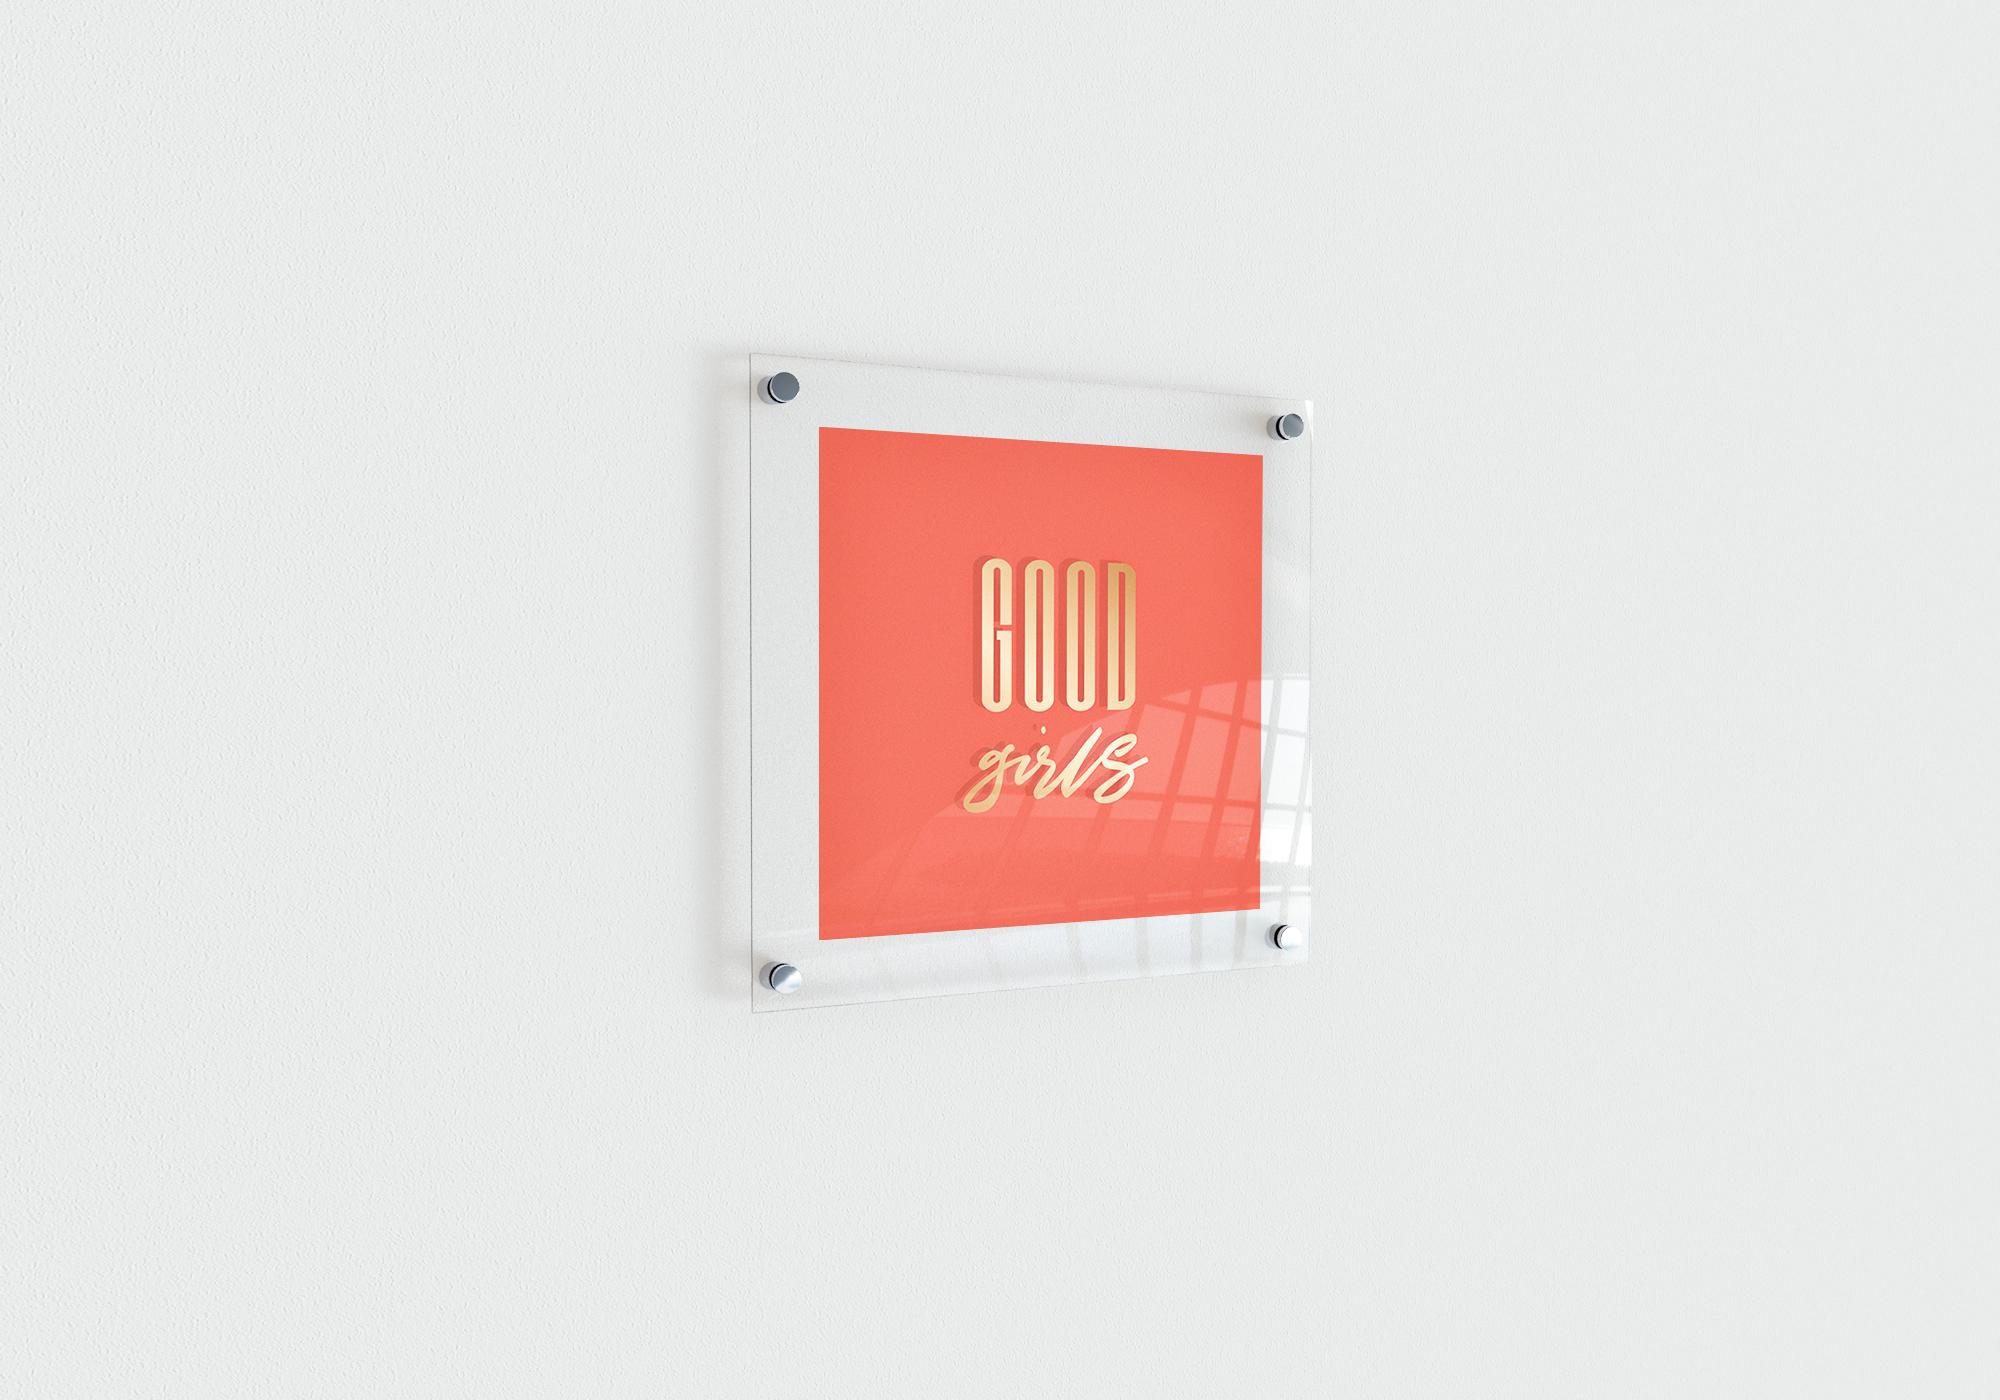 Good girls создание логотипа